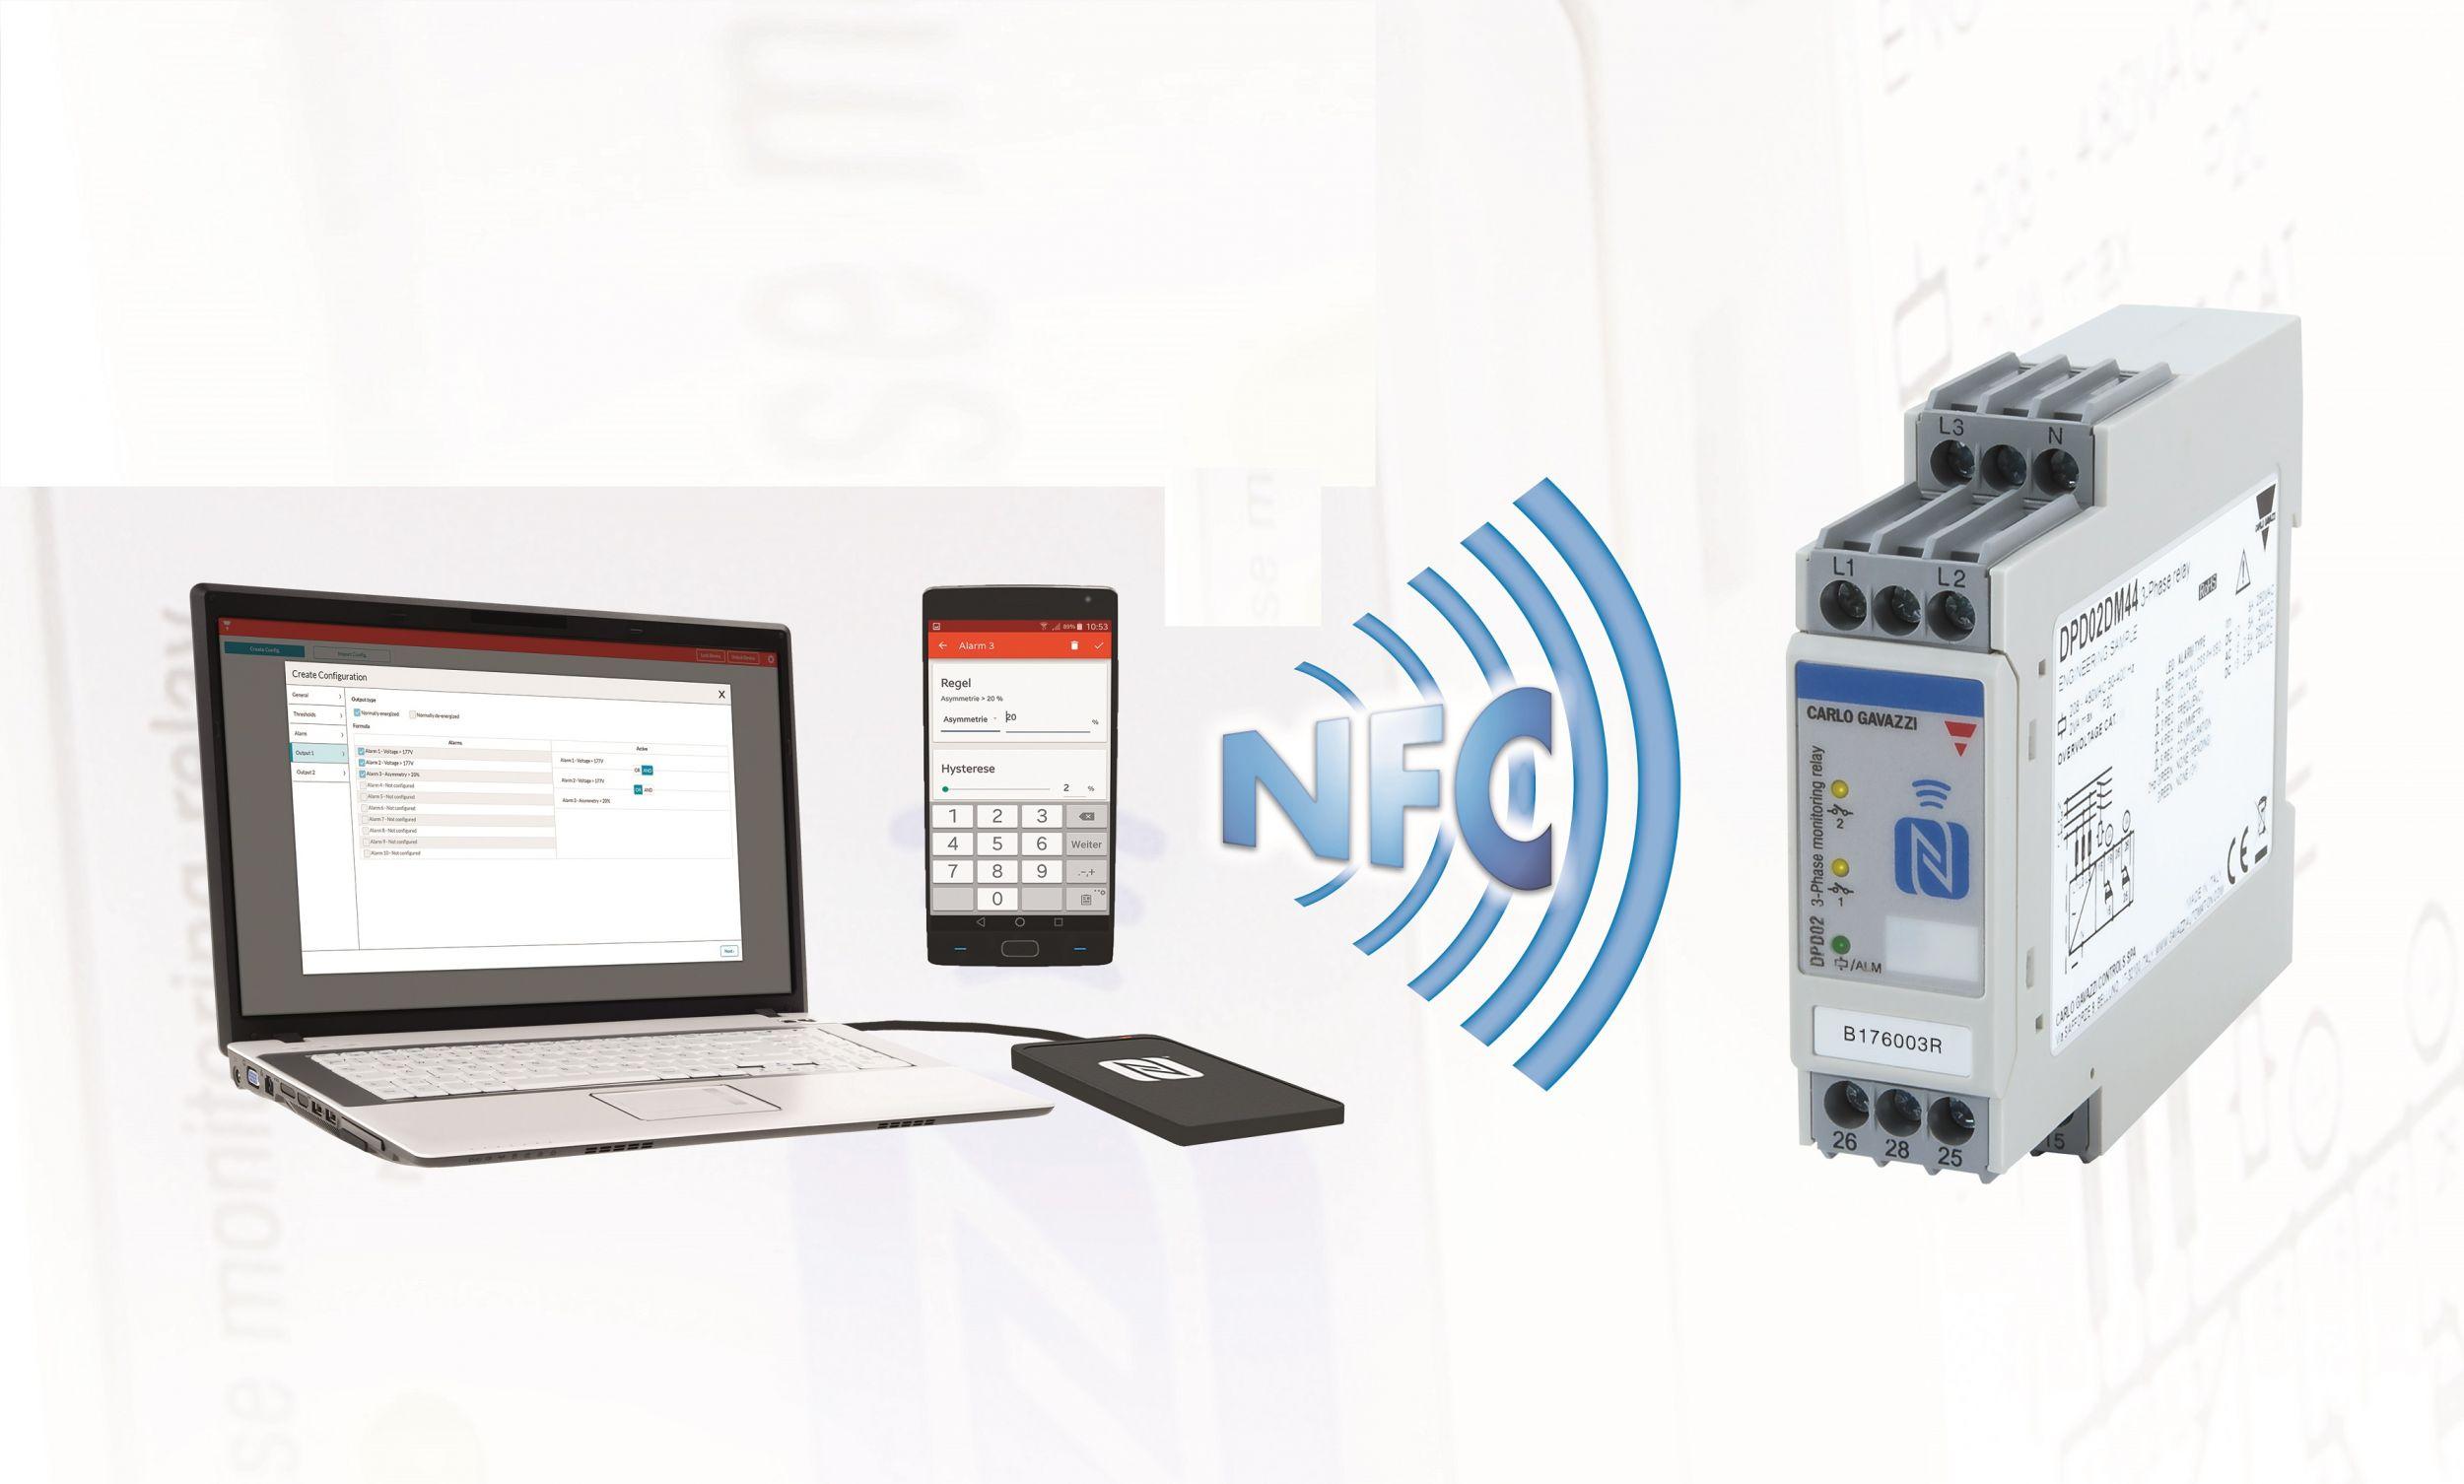 NFC-gesteuerte Konfiguration